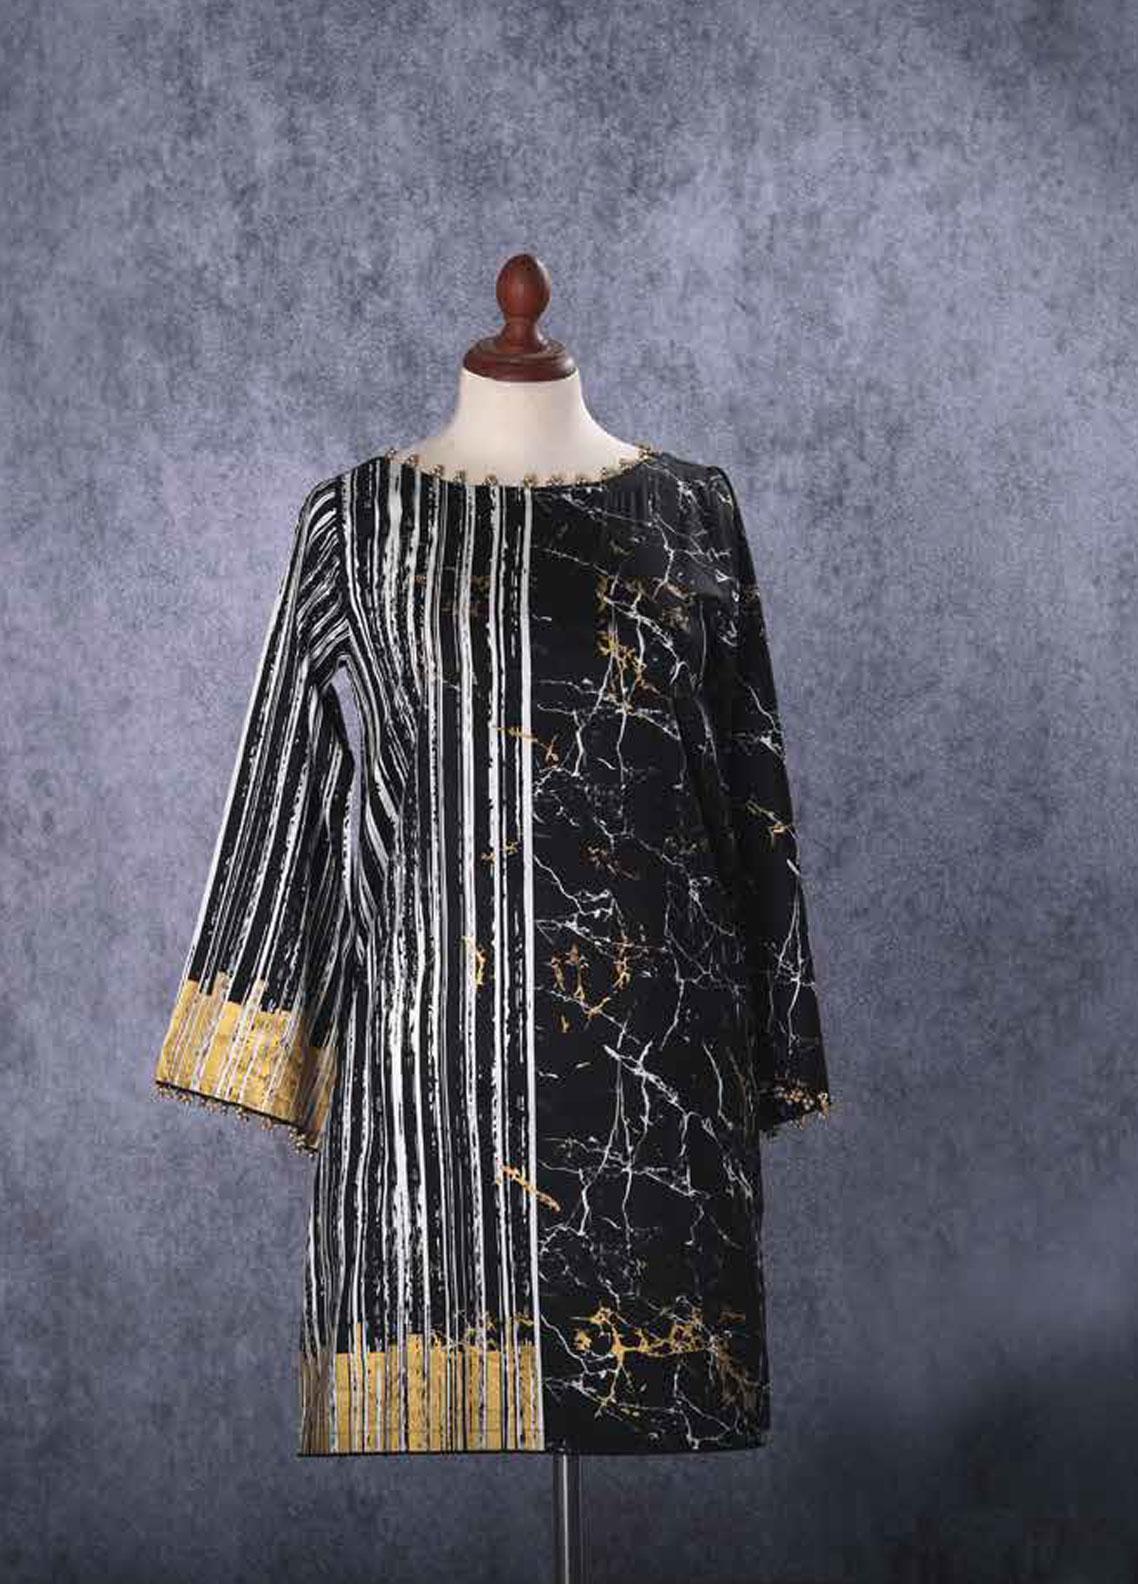 Tarzz Printed Cotton Unstitched Kurties TZ19L 53 IRON BLACK - Mid Summer Collection